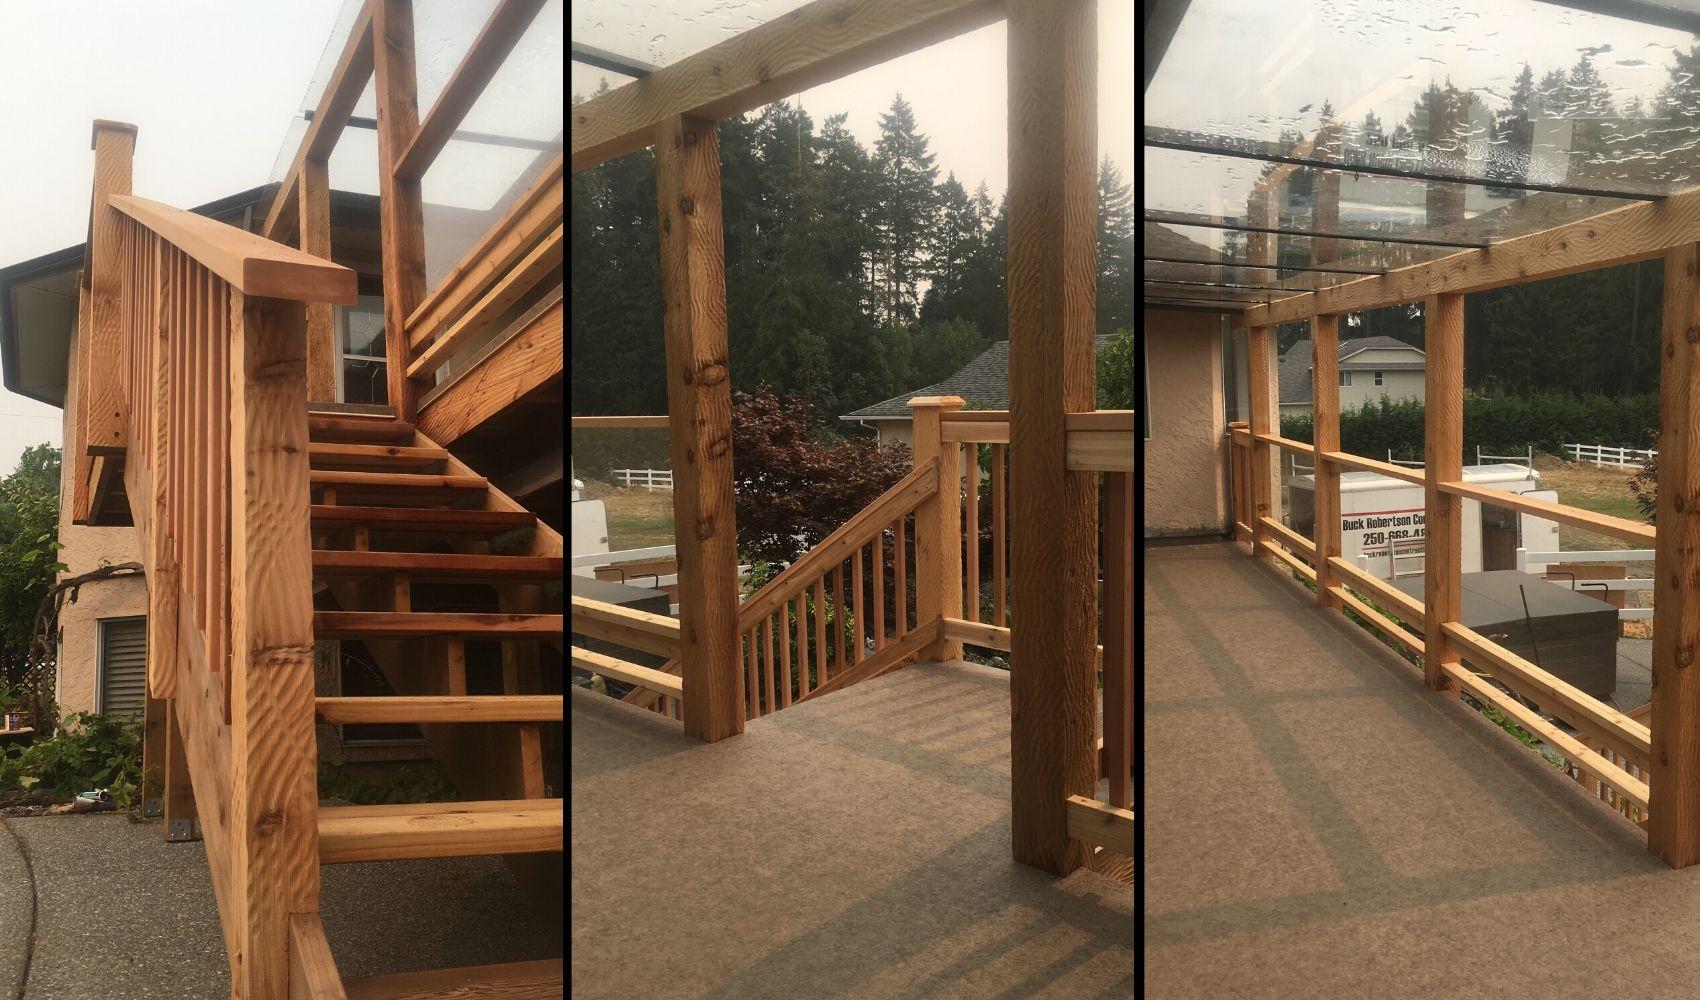 Three shots of the deck